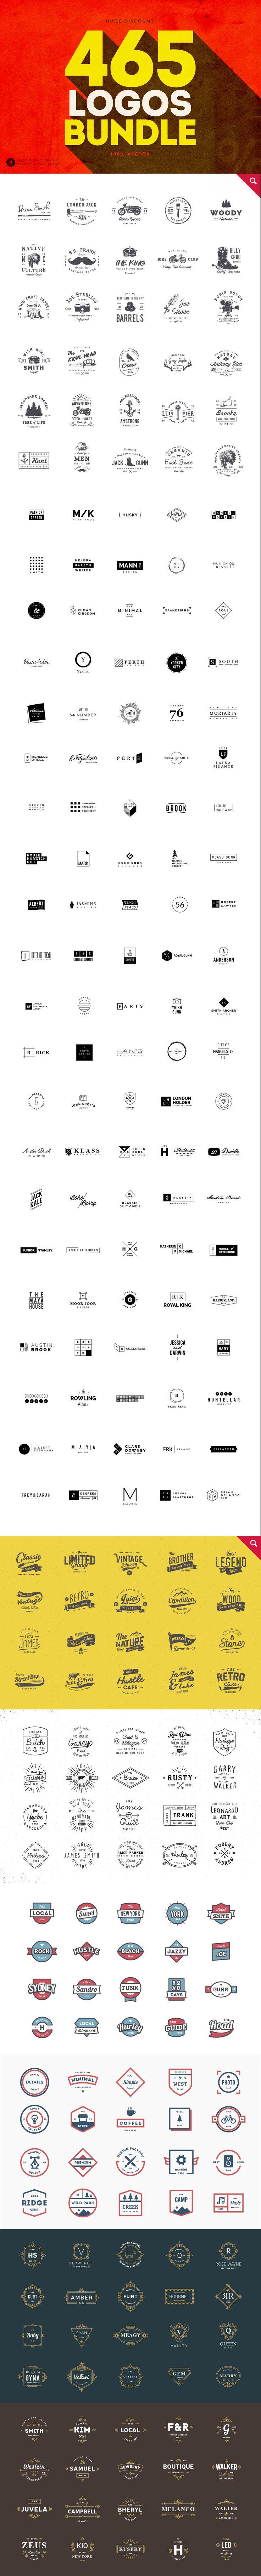 https://creativemarket.com/vuuuds/287274-465-Logos-Bundle